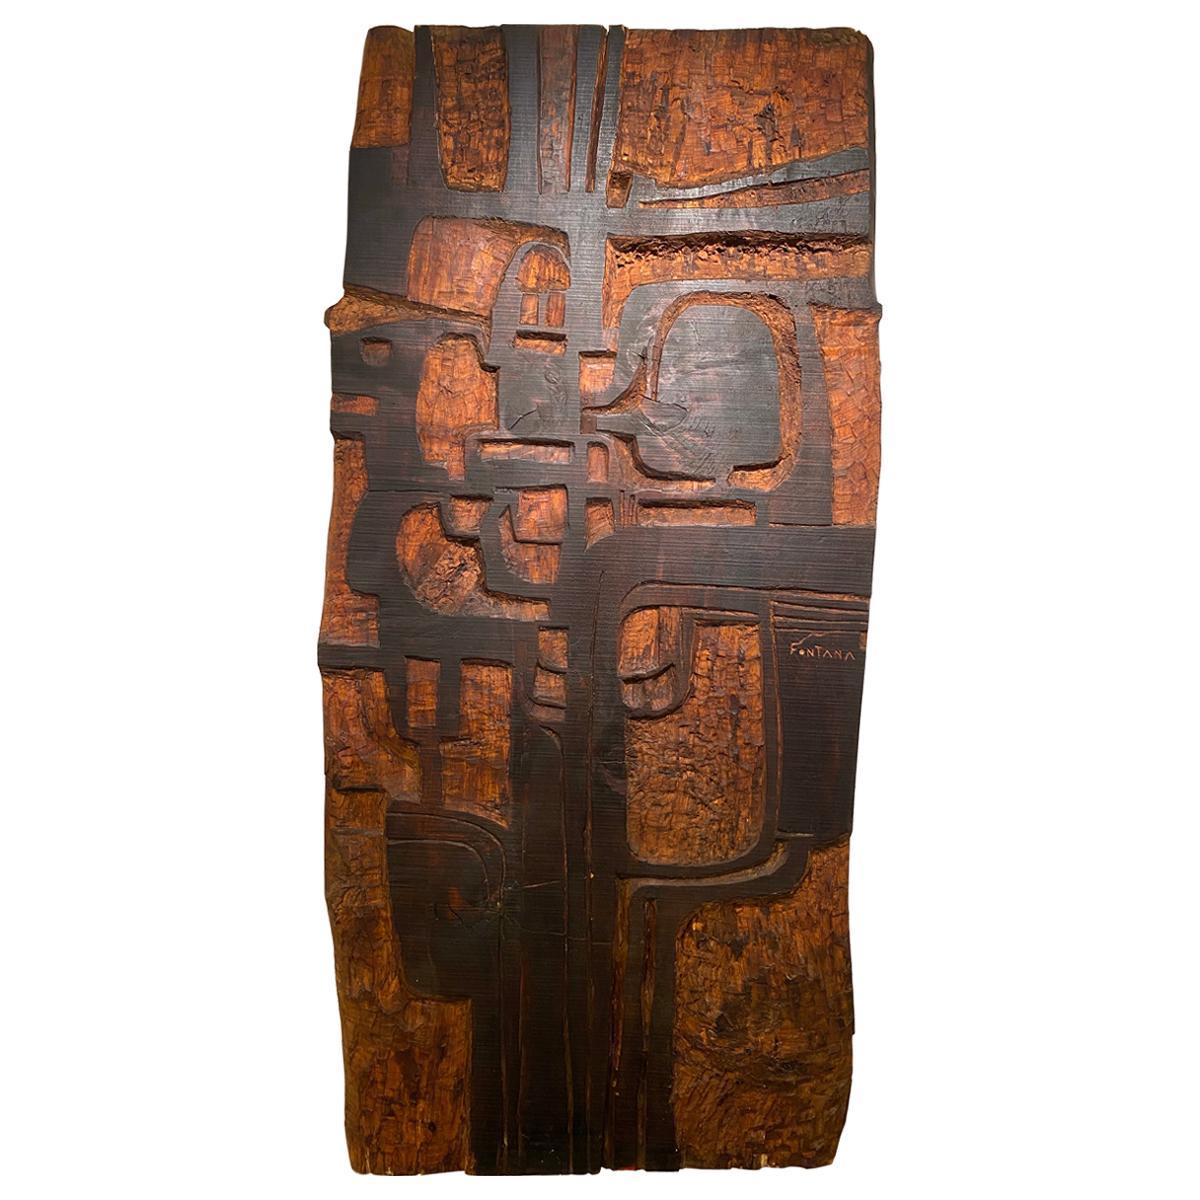 Annemie Fontana Wood Panel Sculpture, 1970s